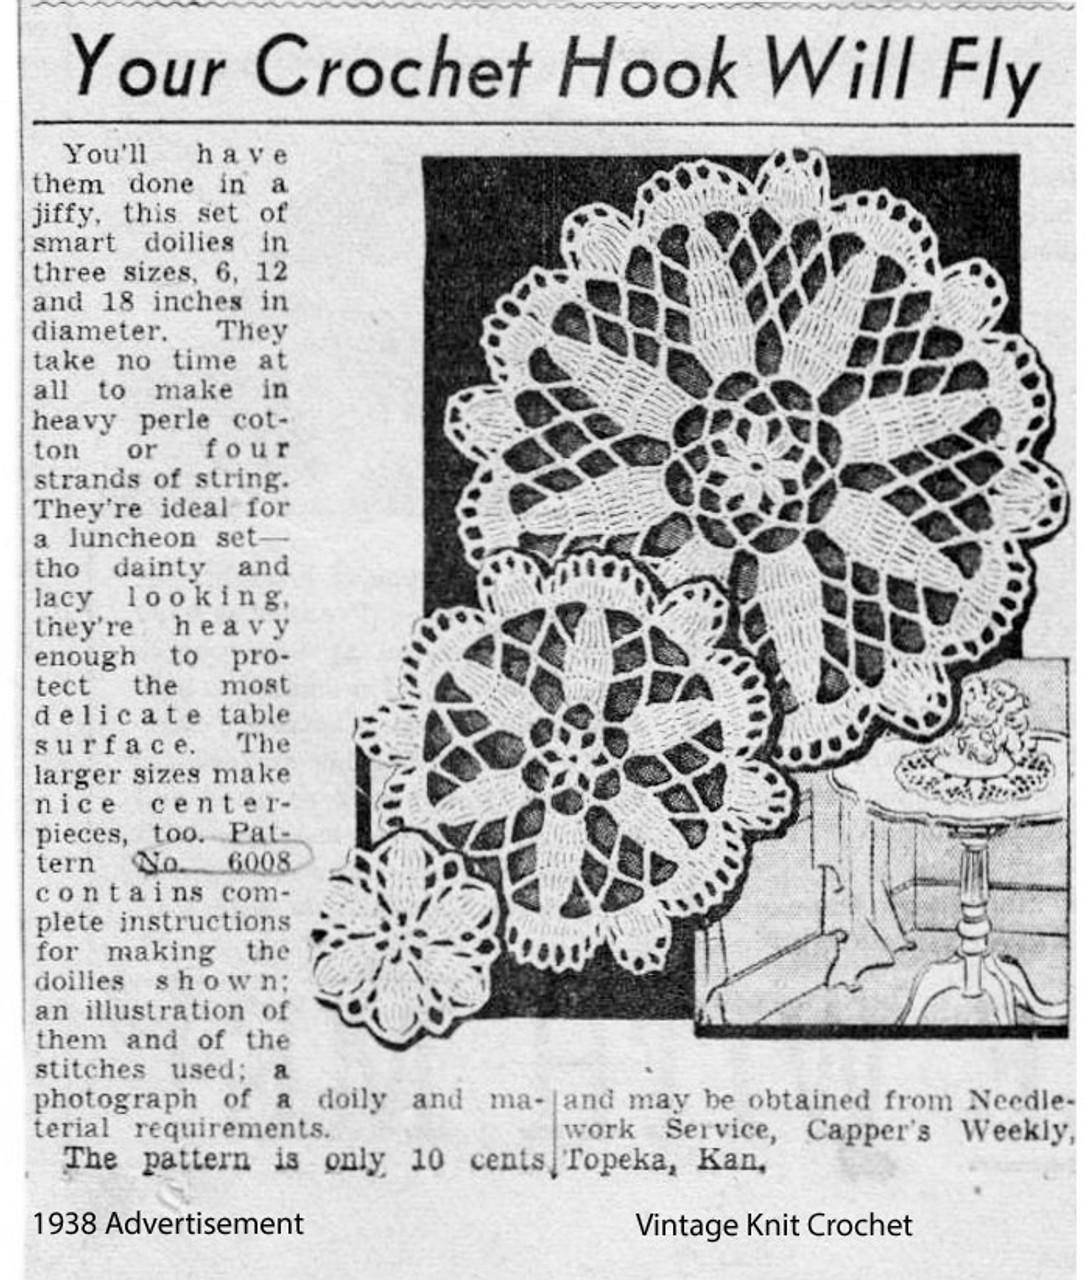 Vintage Crochet Doily Mail Order Advertisement No 6008